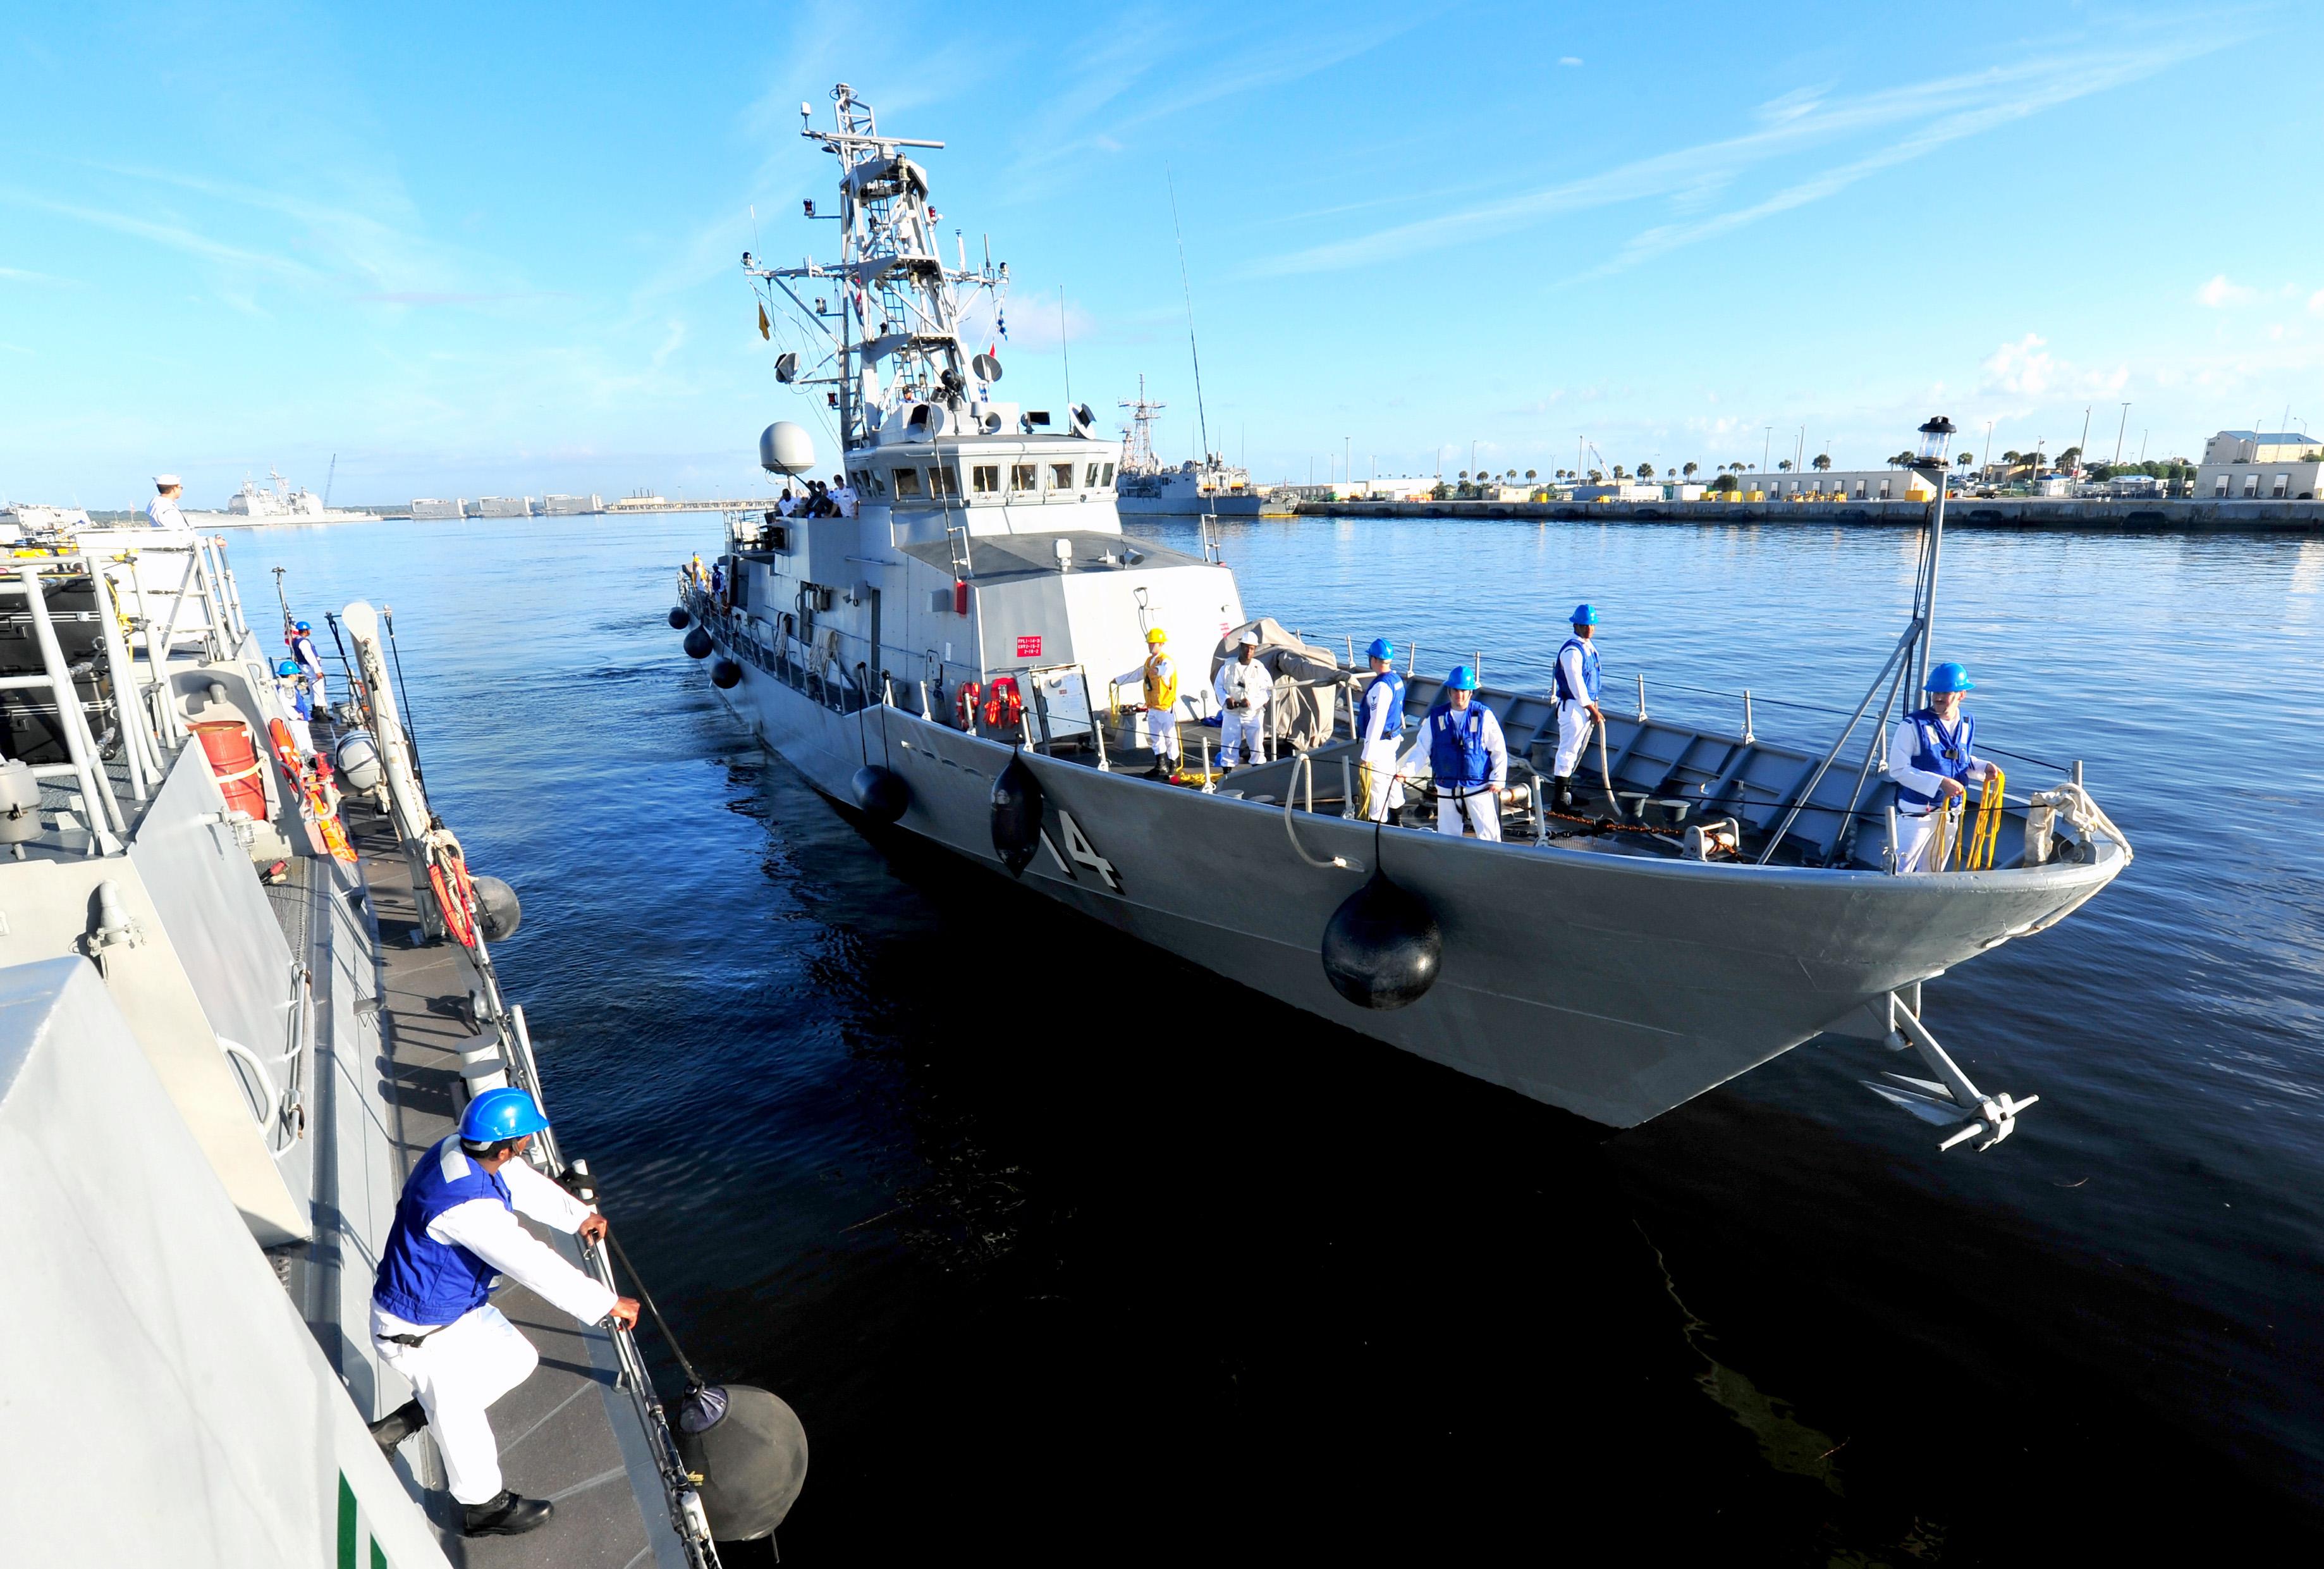 USS TORNADO PC-14 neben der USS ZEPHYR PC-8 am 31.10.2013 in MayportBild: U.S. Navy